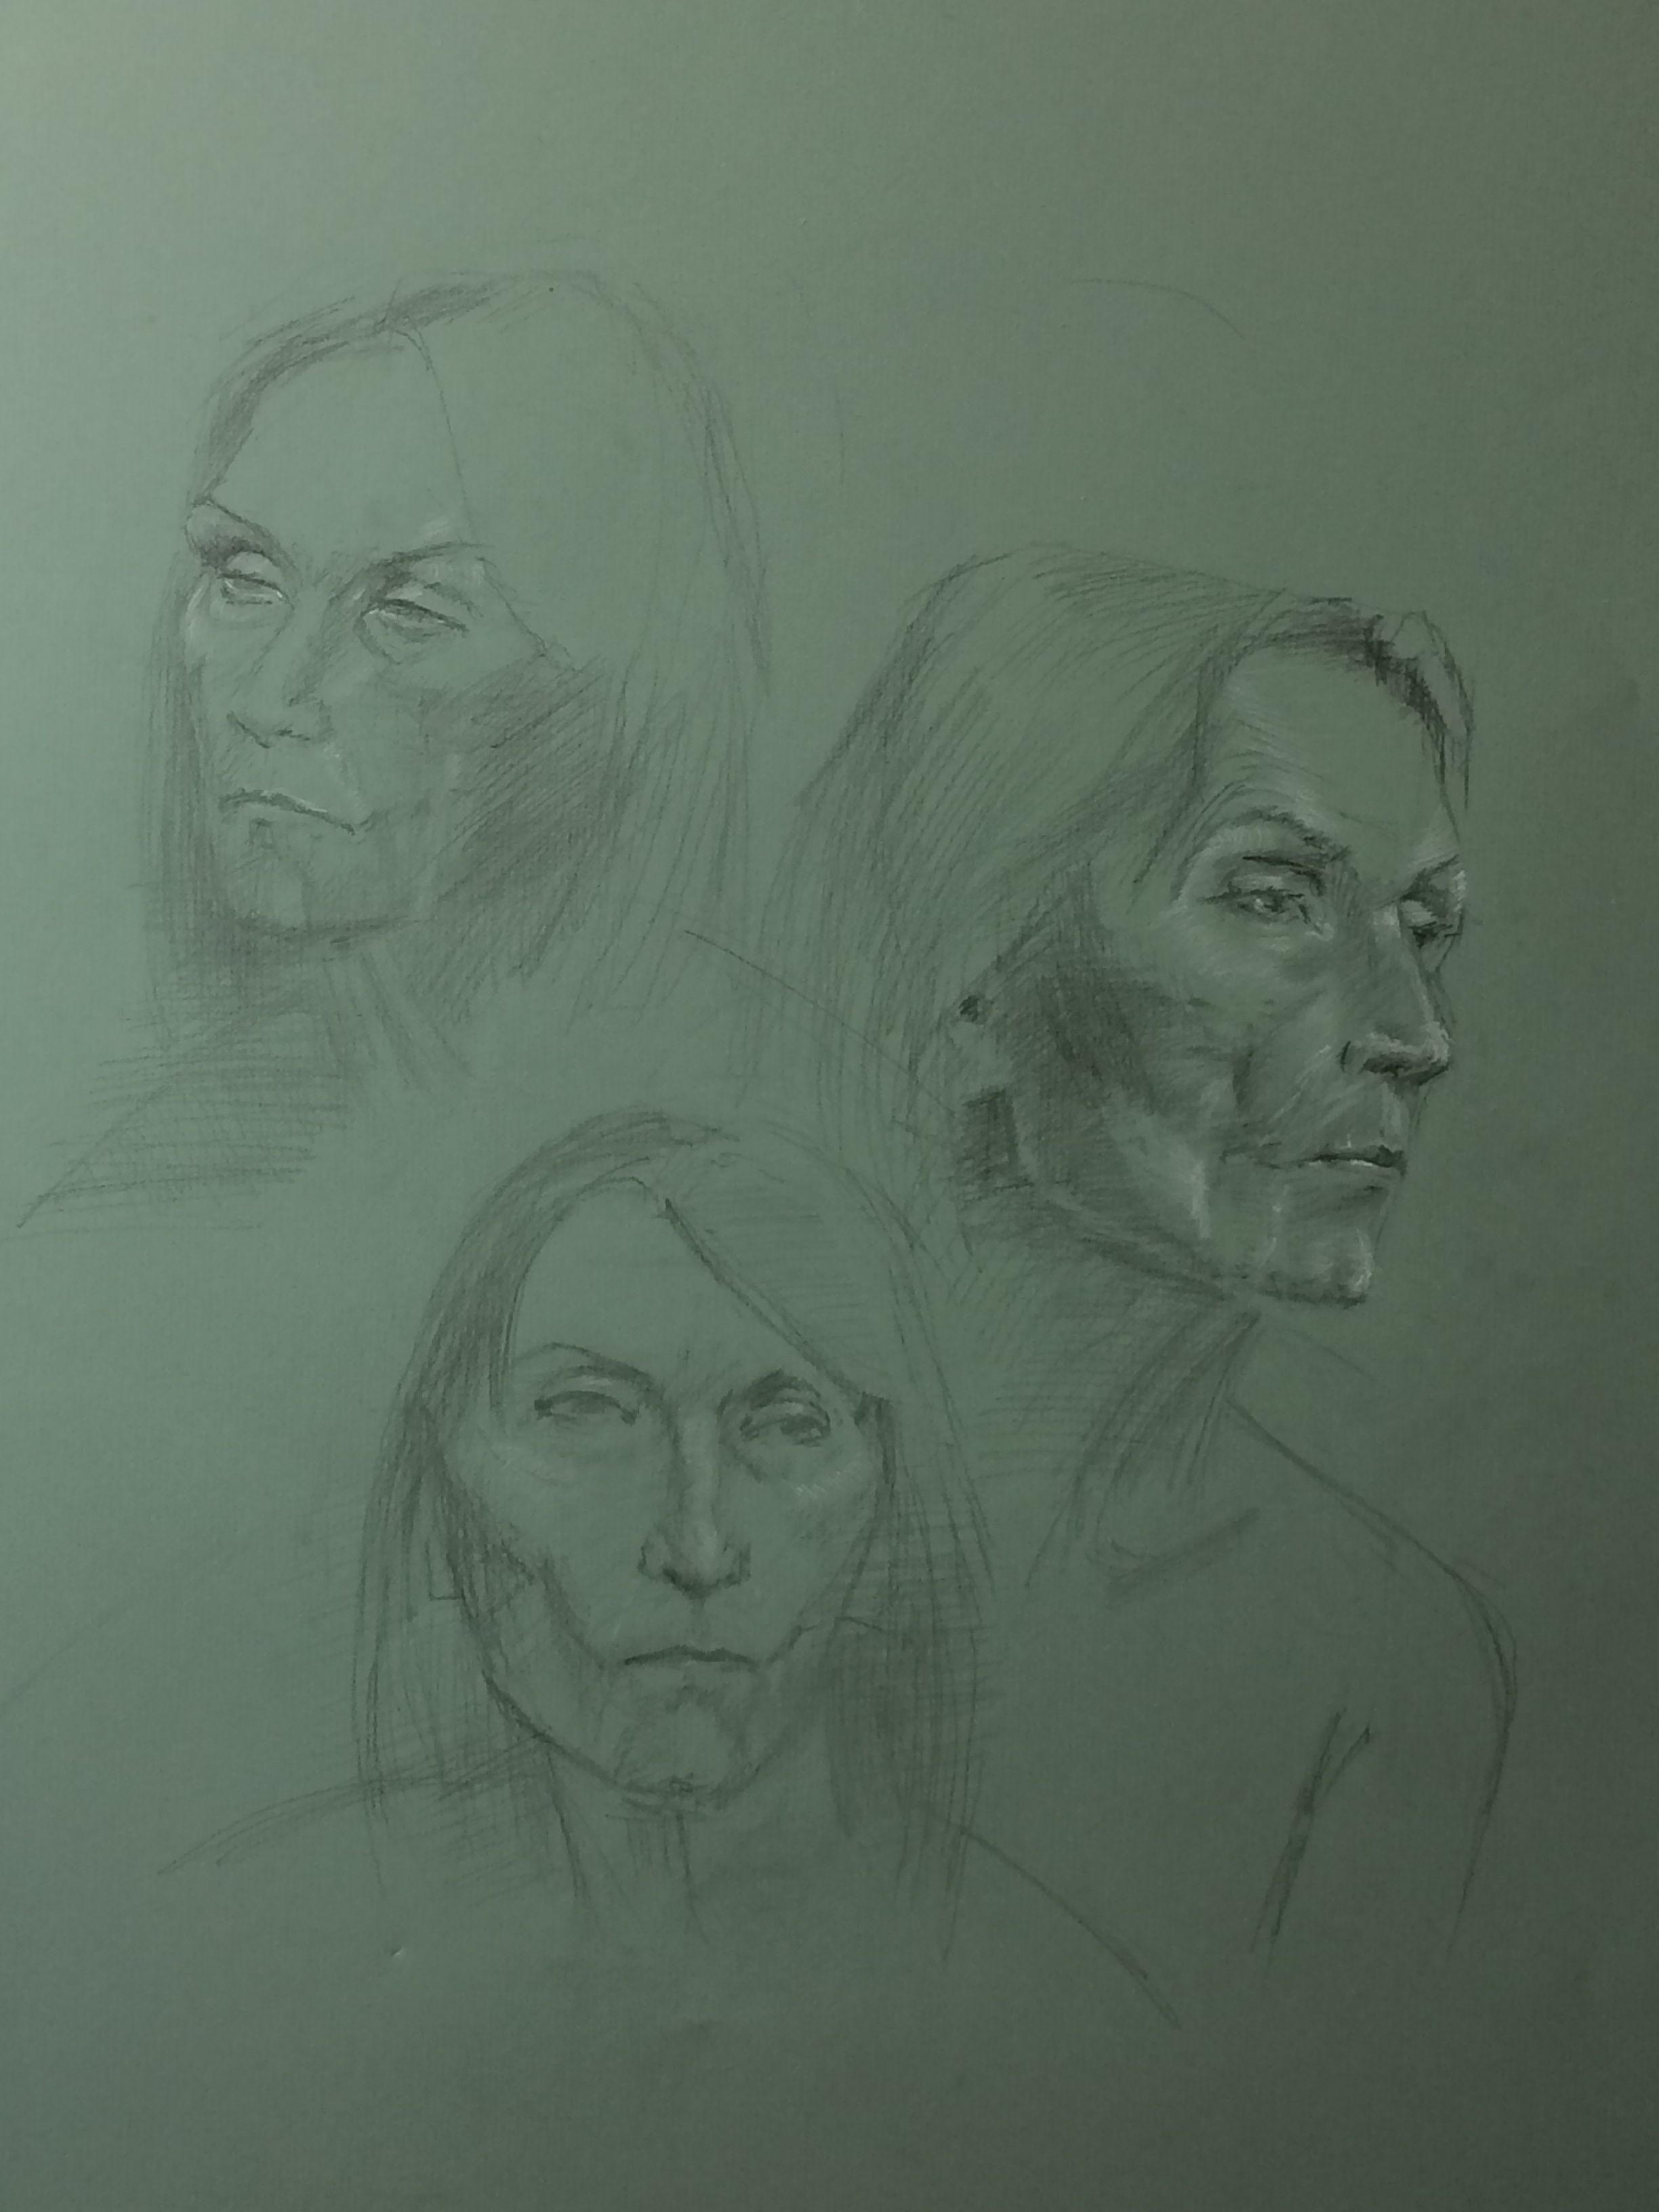 Anna Nina 20 mins sketches